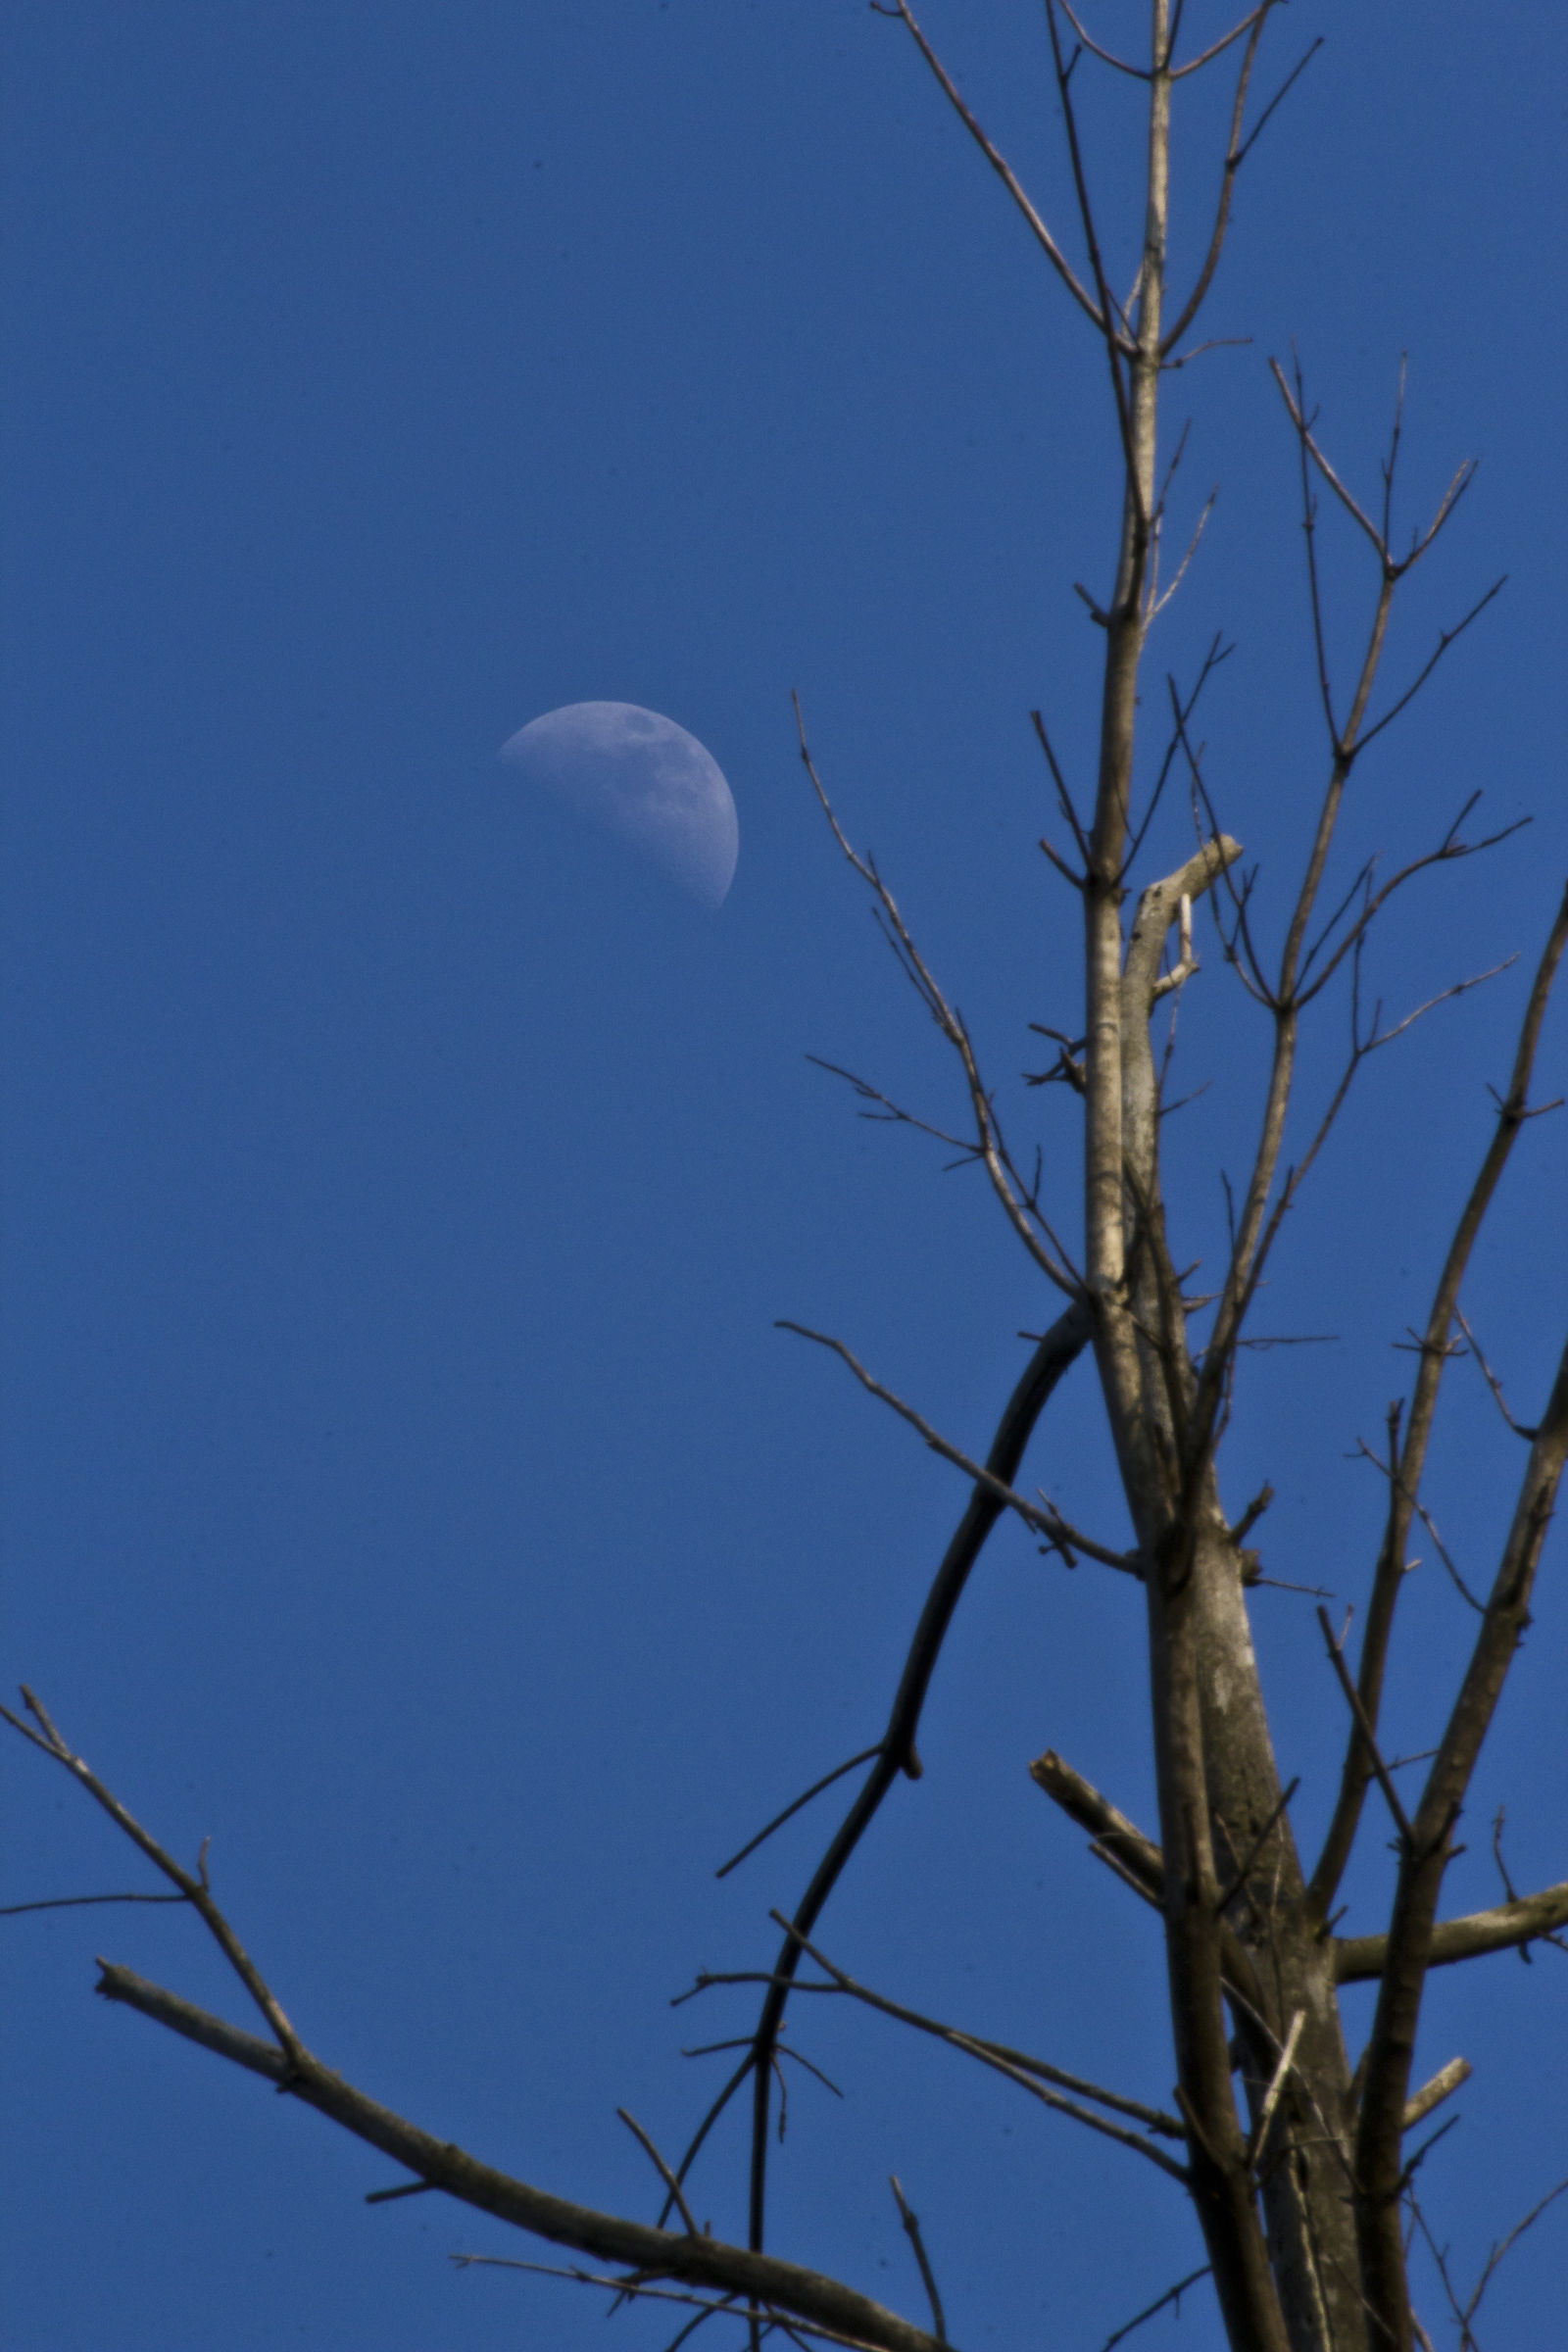 Moon and albero2...